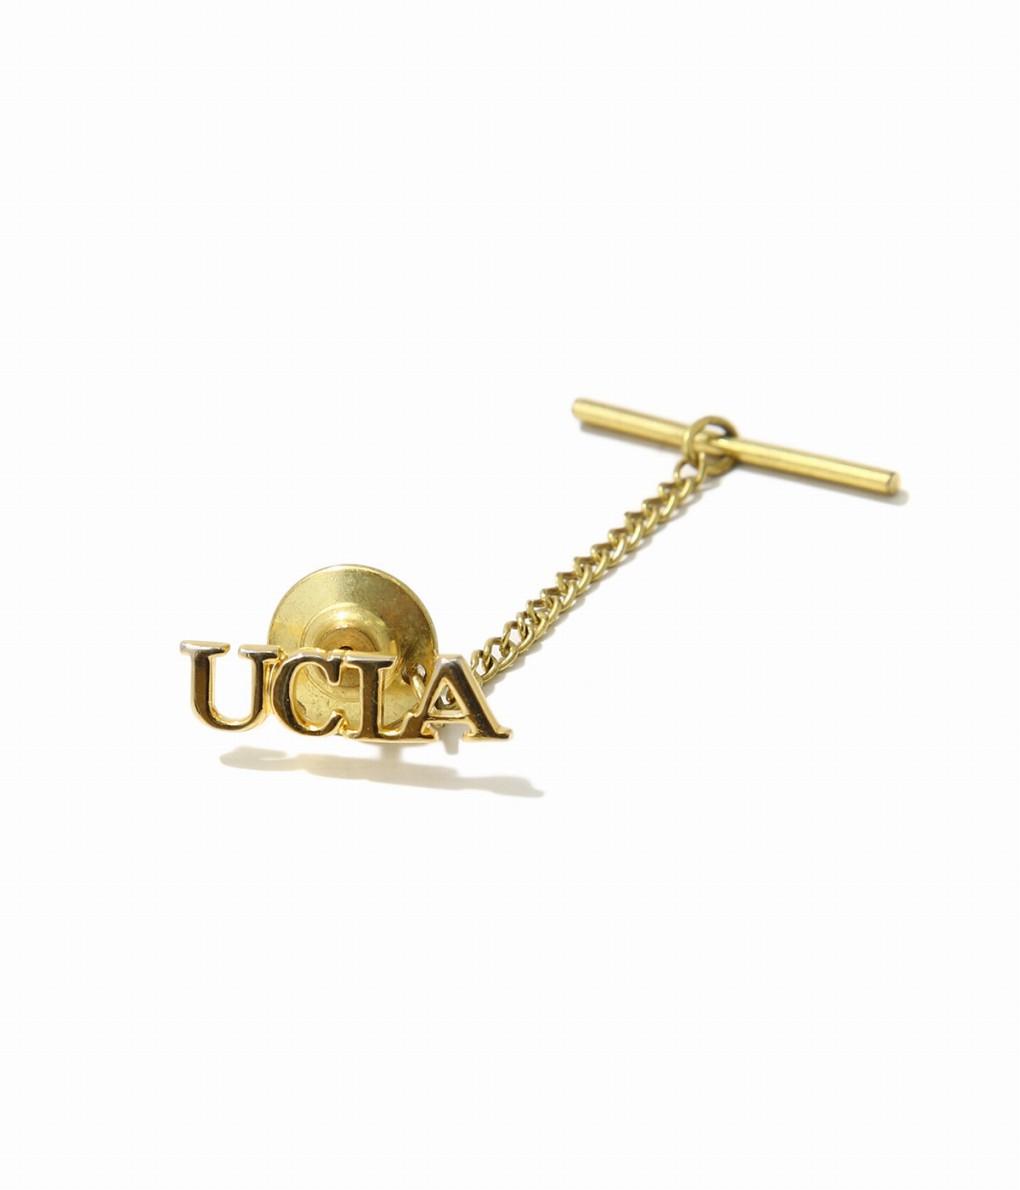 VINTAGE / ヴィンテージ : VINTAGE TIFFANY UCLA PIN : ヴィンテージ ティファニー アクセサリー アンティーク ピン ギフト プレゼント ラッピング可能 クリスマス : VT-TF-UCLA-PIN-D【VIN】